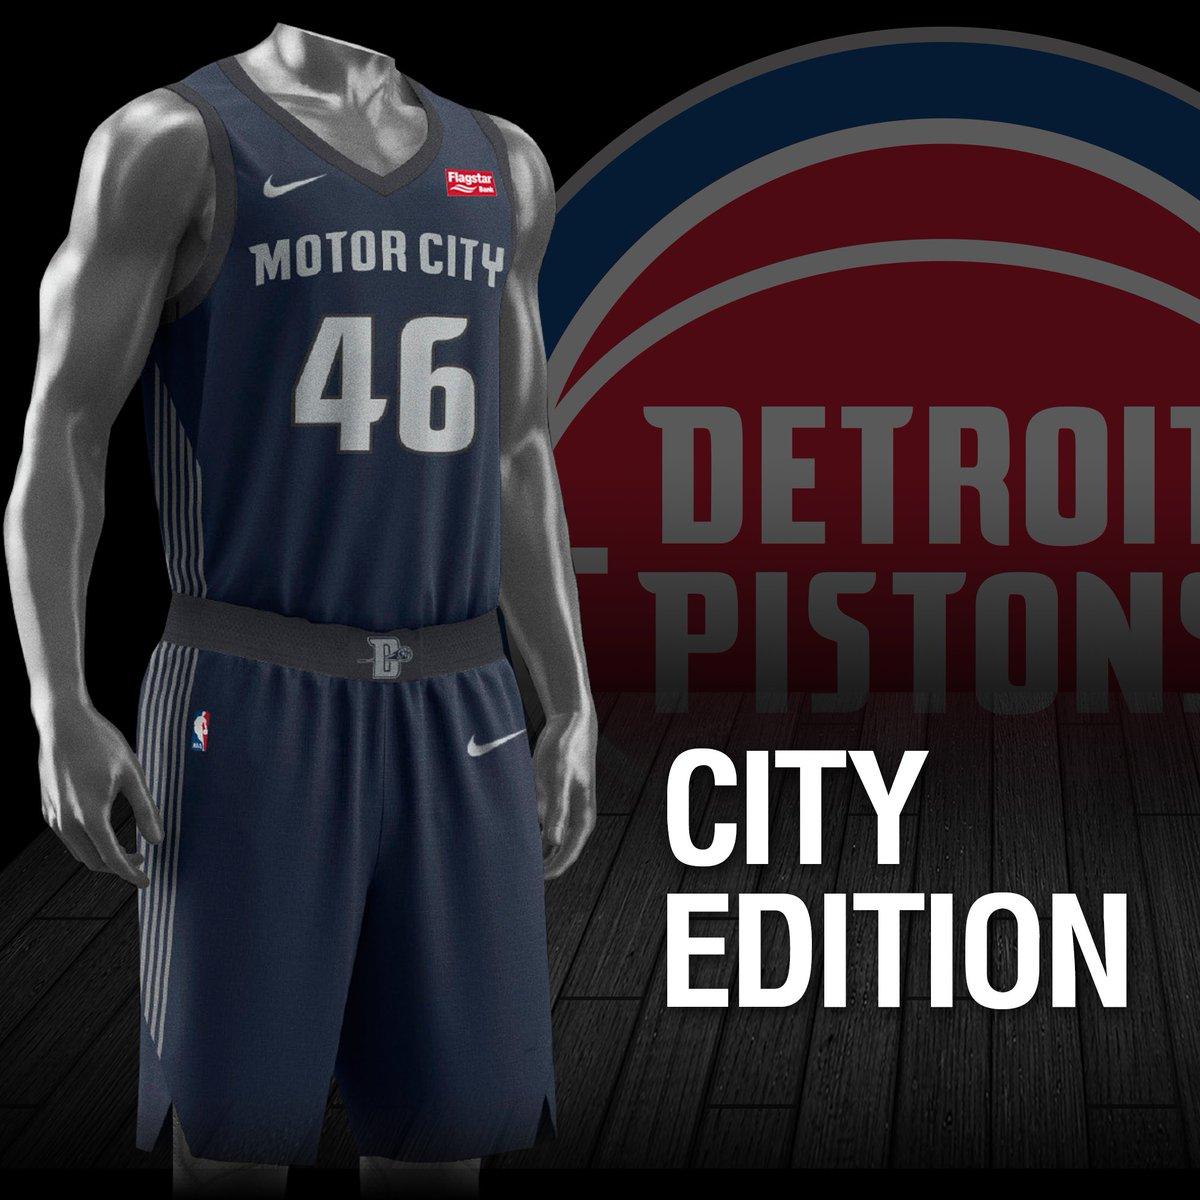 new style 06880 86d78 Detroit Pistons on Twitter: